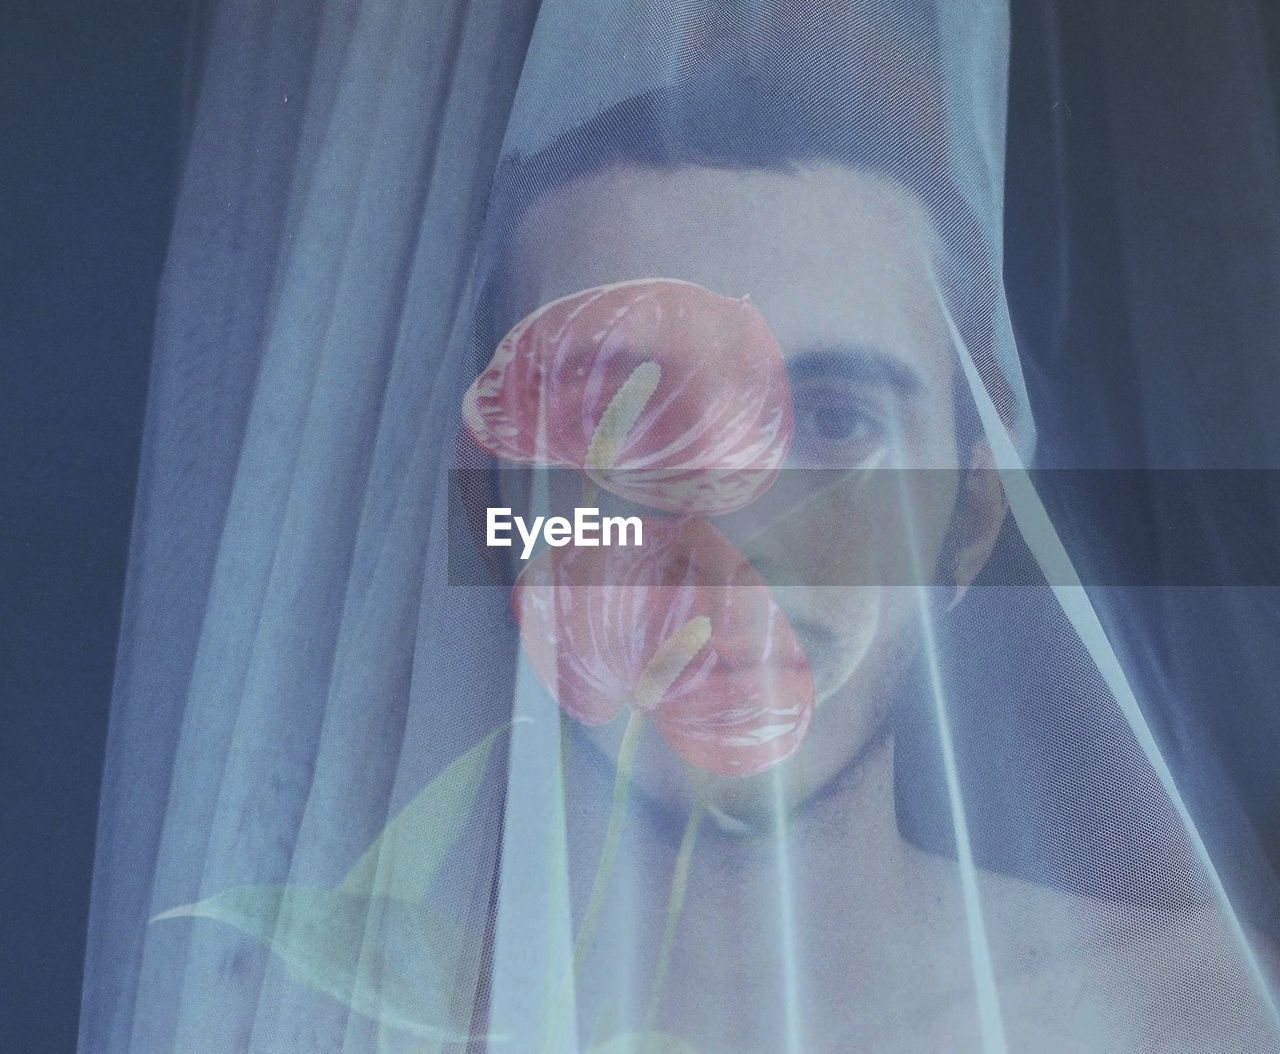 Close-up portrait of man against curtain